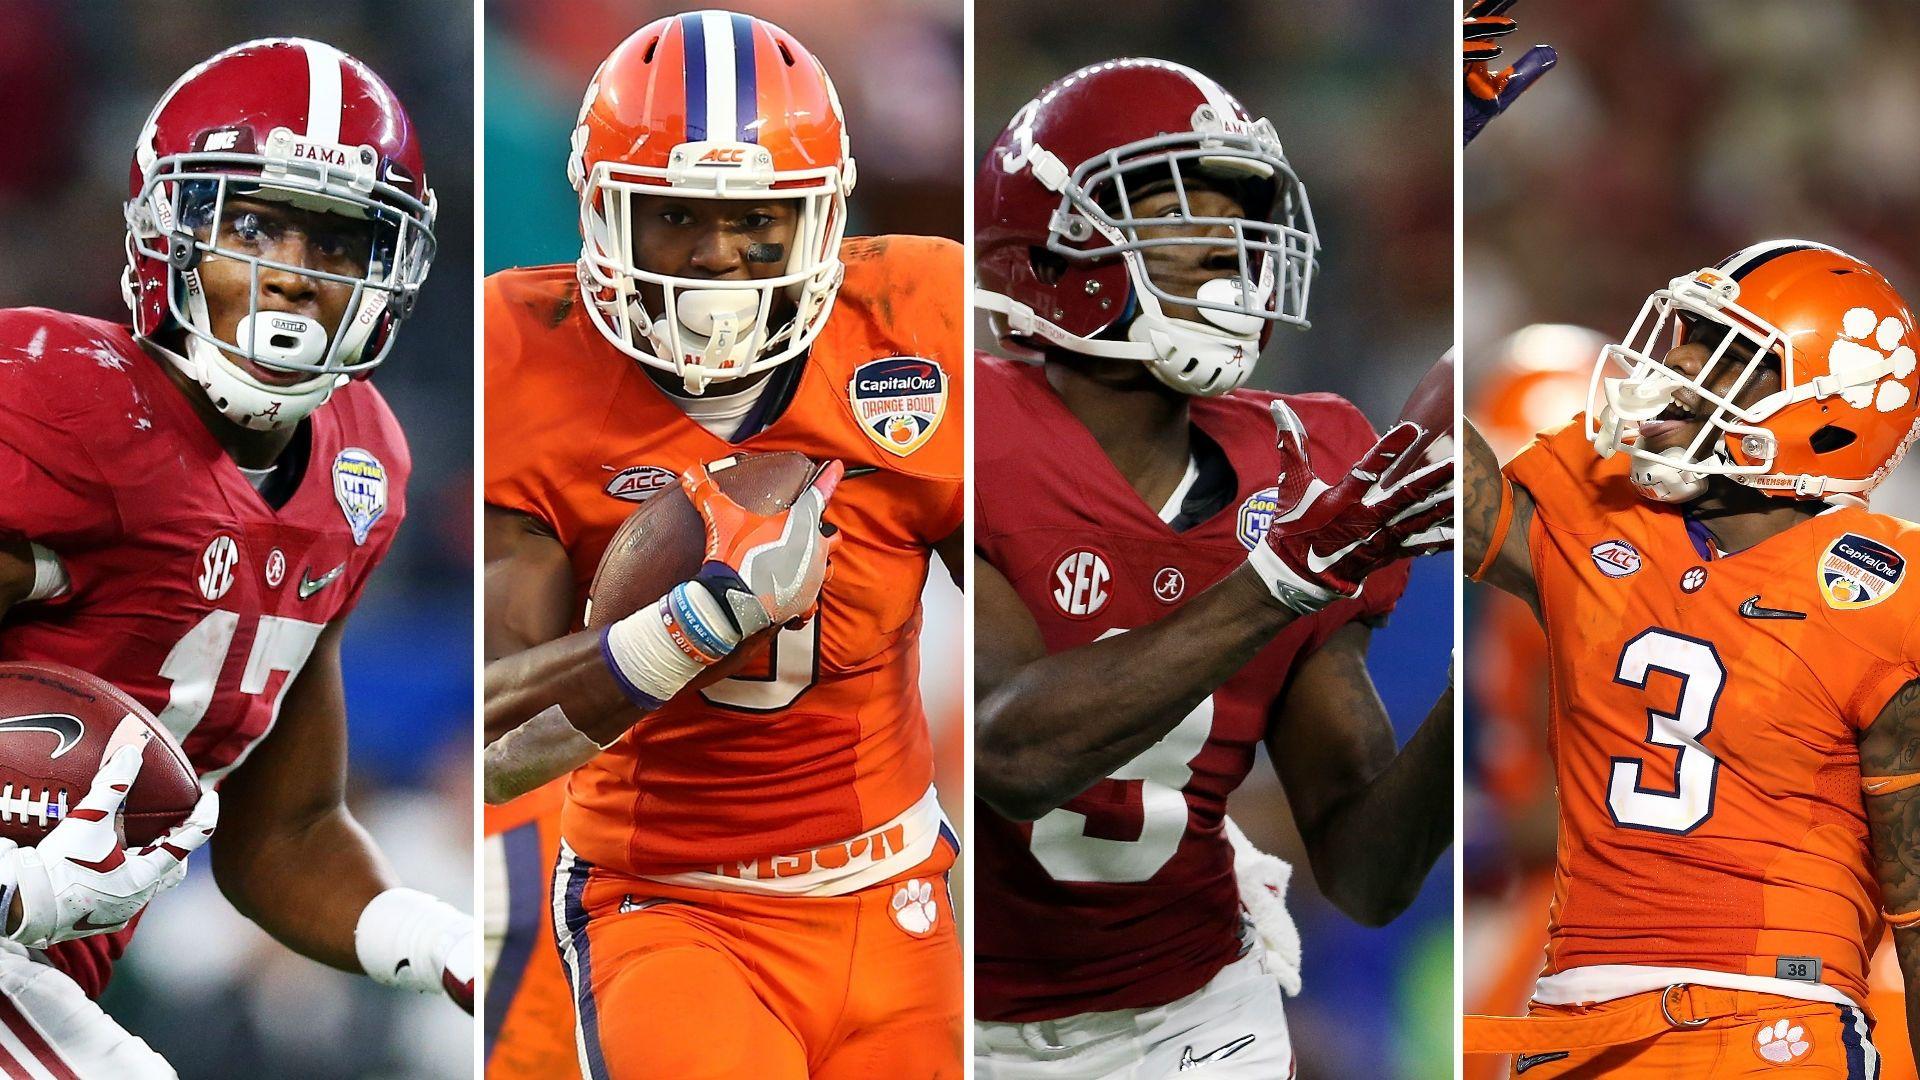 75 Average Fans Crush Espn S Picks For College Football Bowl Games